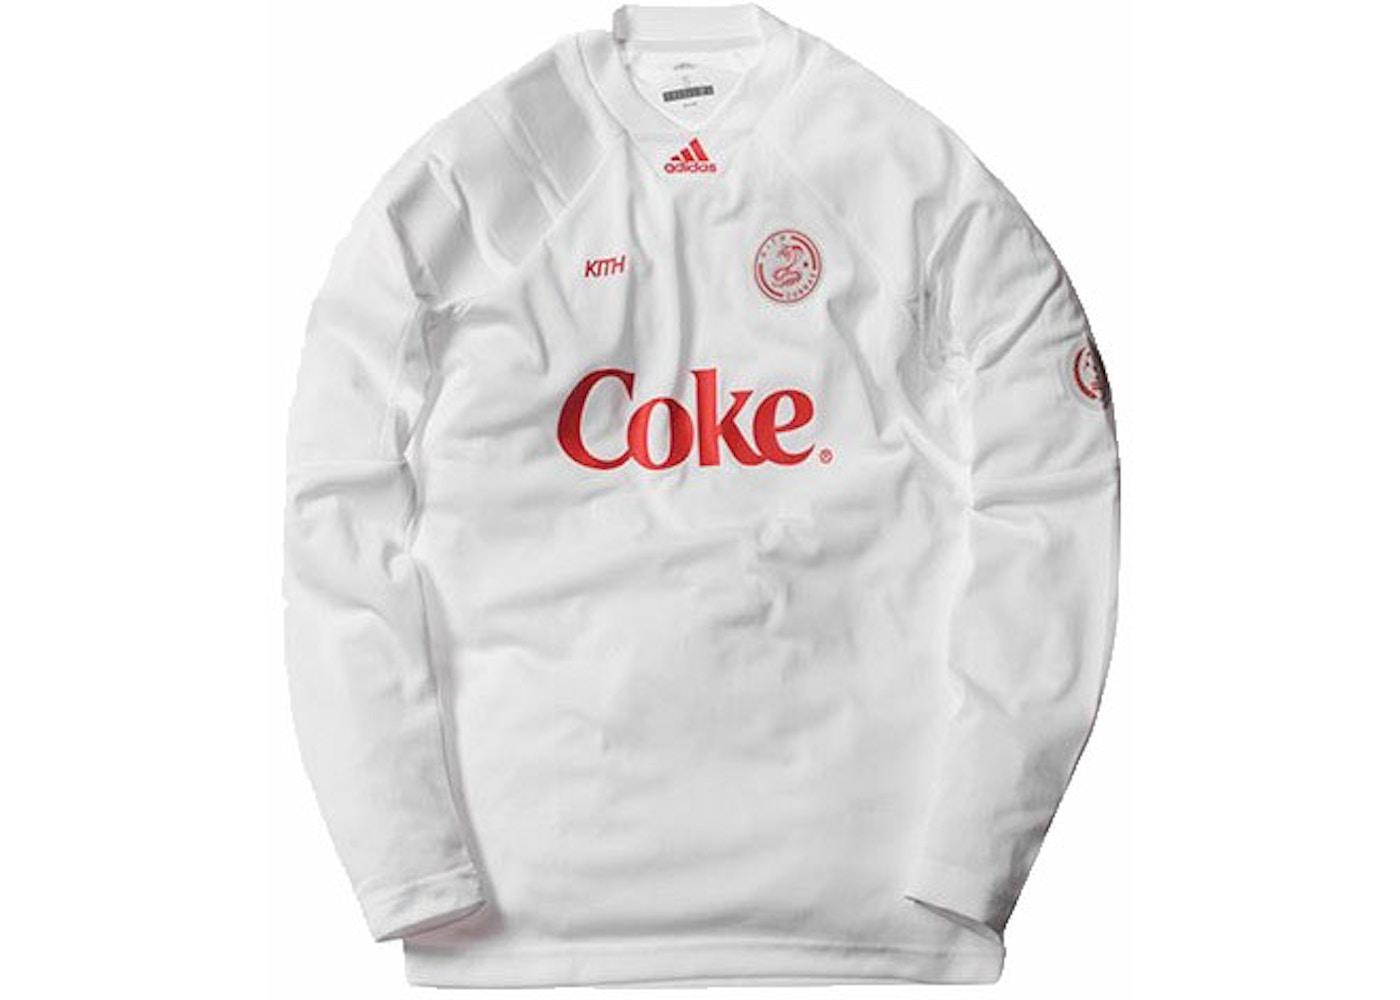 Streetwear - Kith Tops Sweatshirts - Volatility b5665bb51